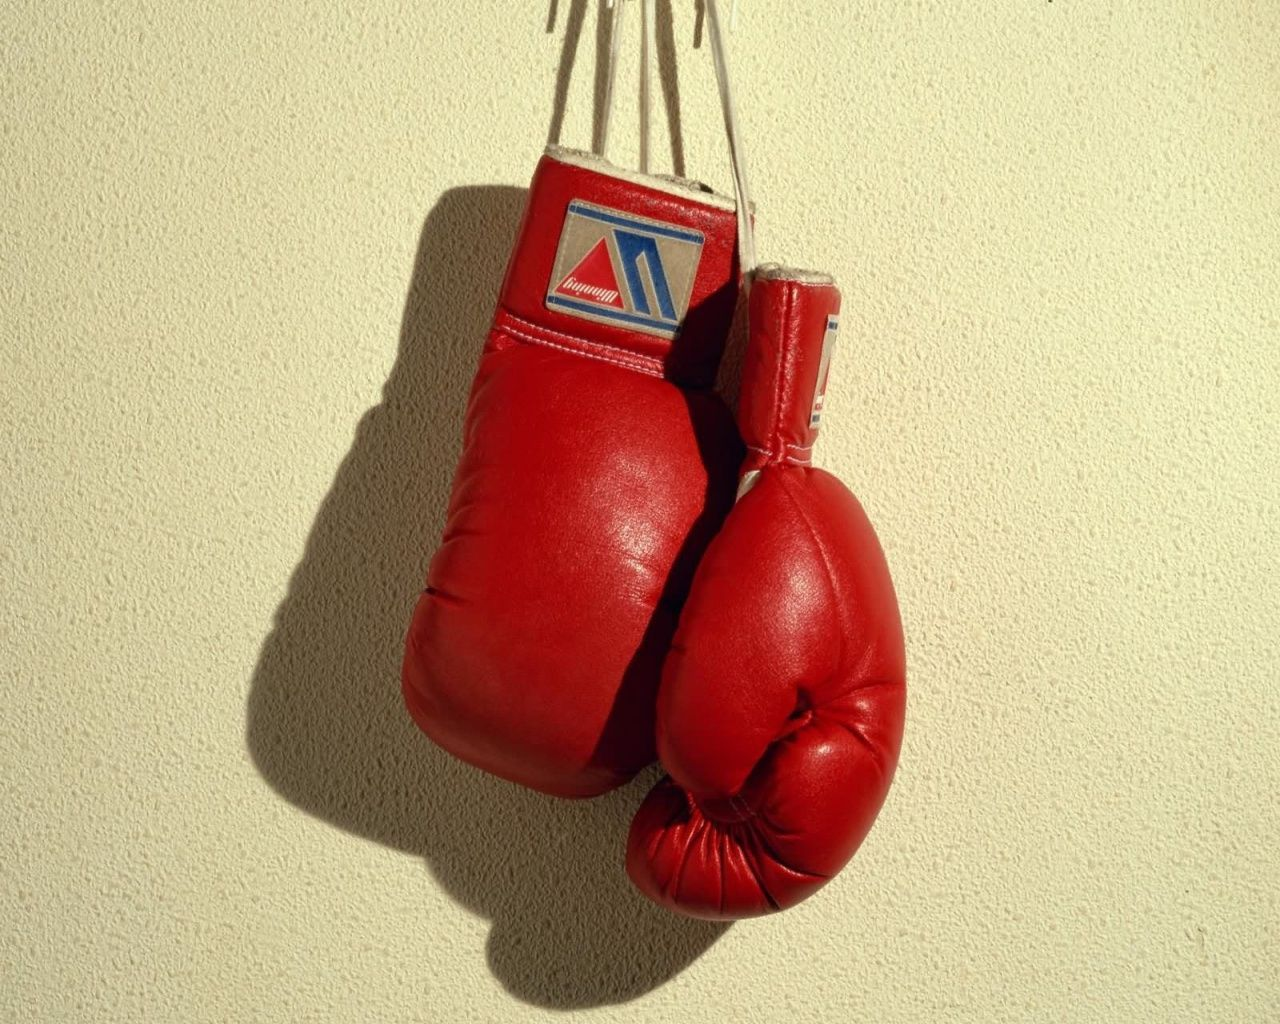 Shiv Naresh Teens Boxing Gloves 12oz: Boxing Gloves Wallpapers - Wallpaper Cave